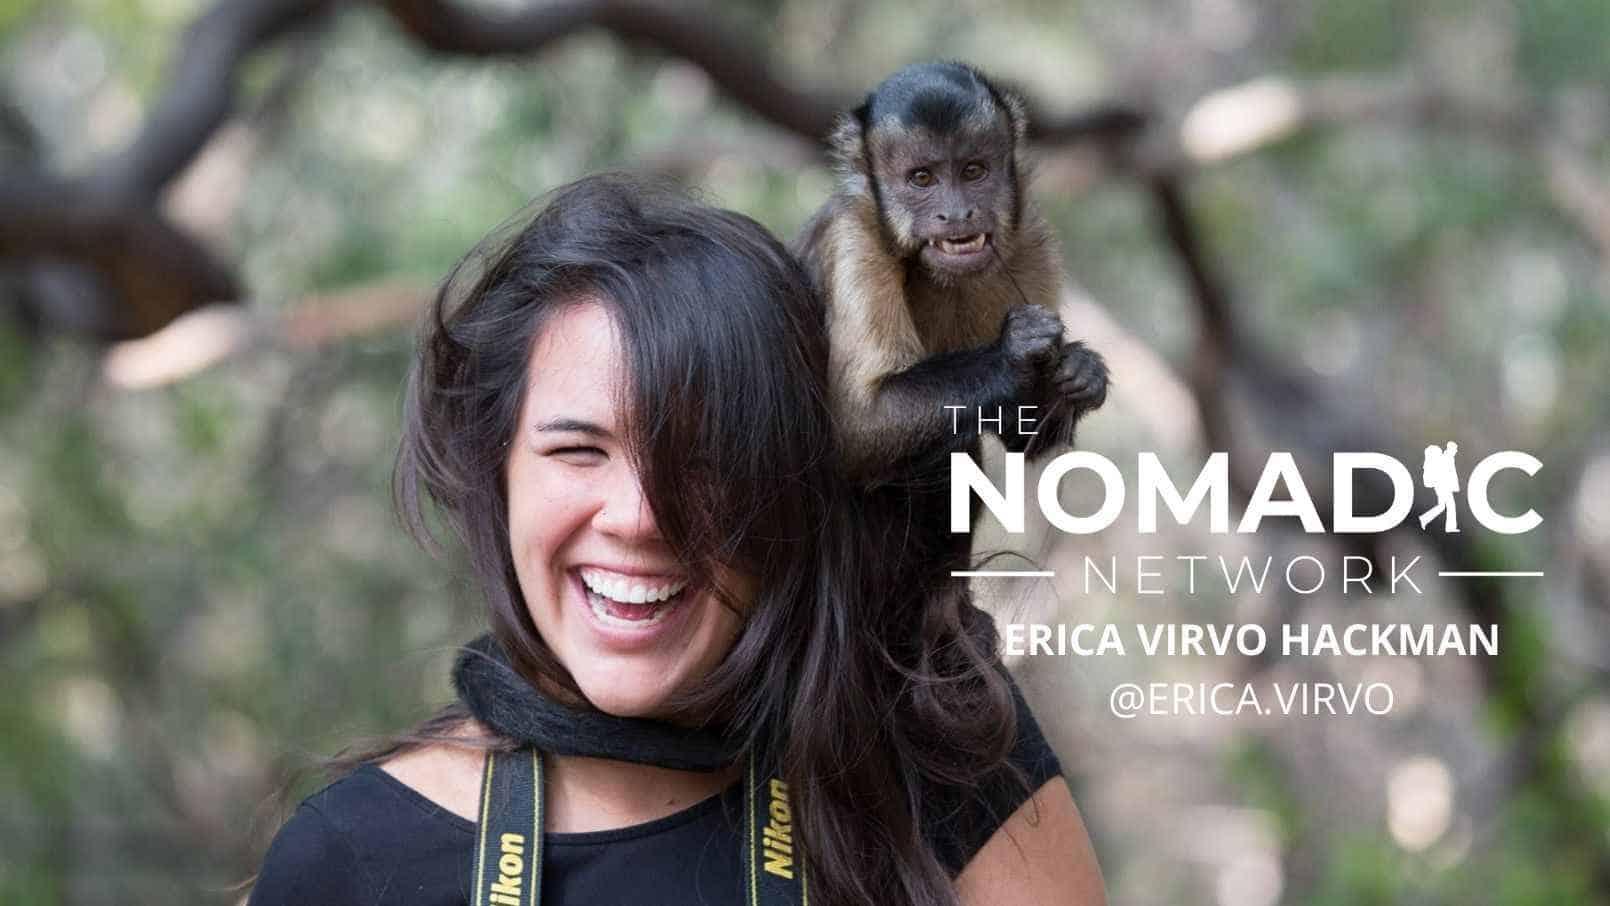 TNN host Erica with a monkey on her head